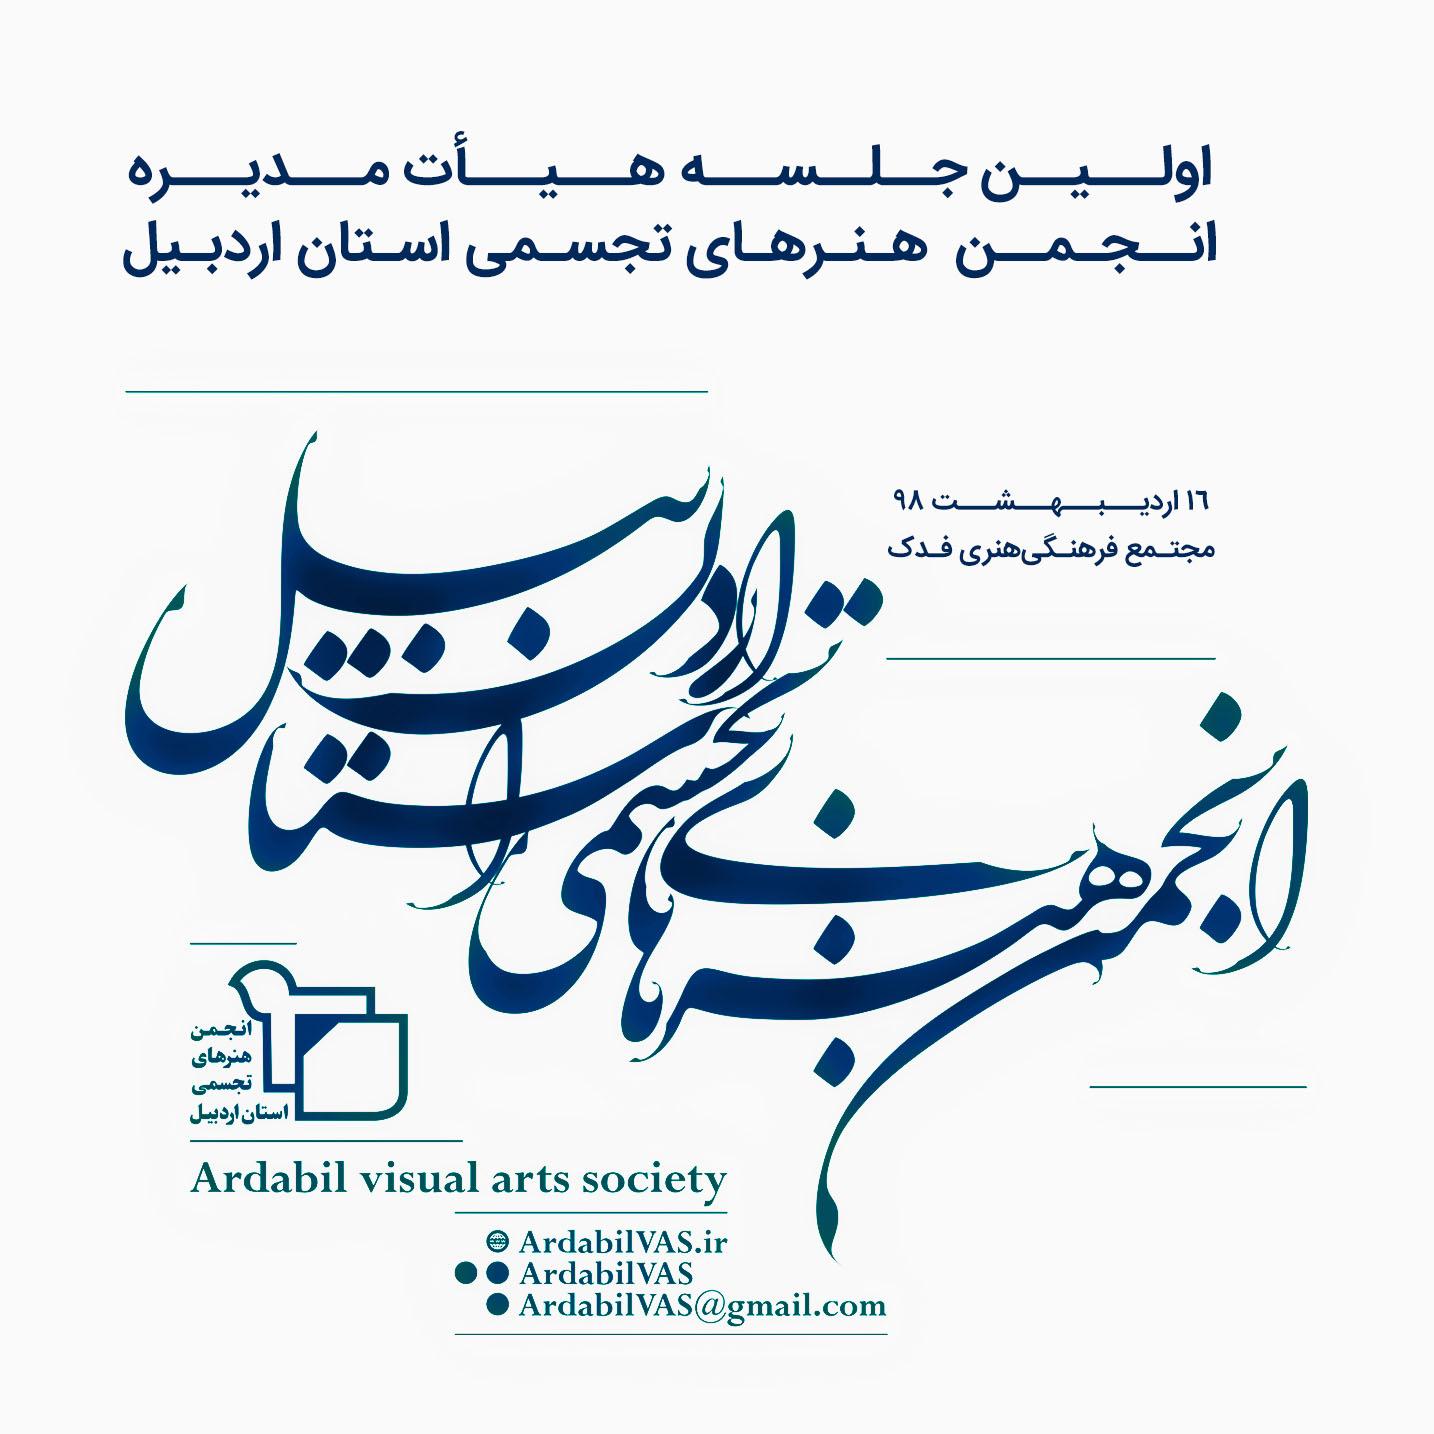 Photo of اولین جلسه هیئت مدیره انتخابی انجمن هنرهای تجسمی